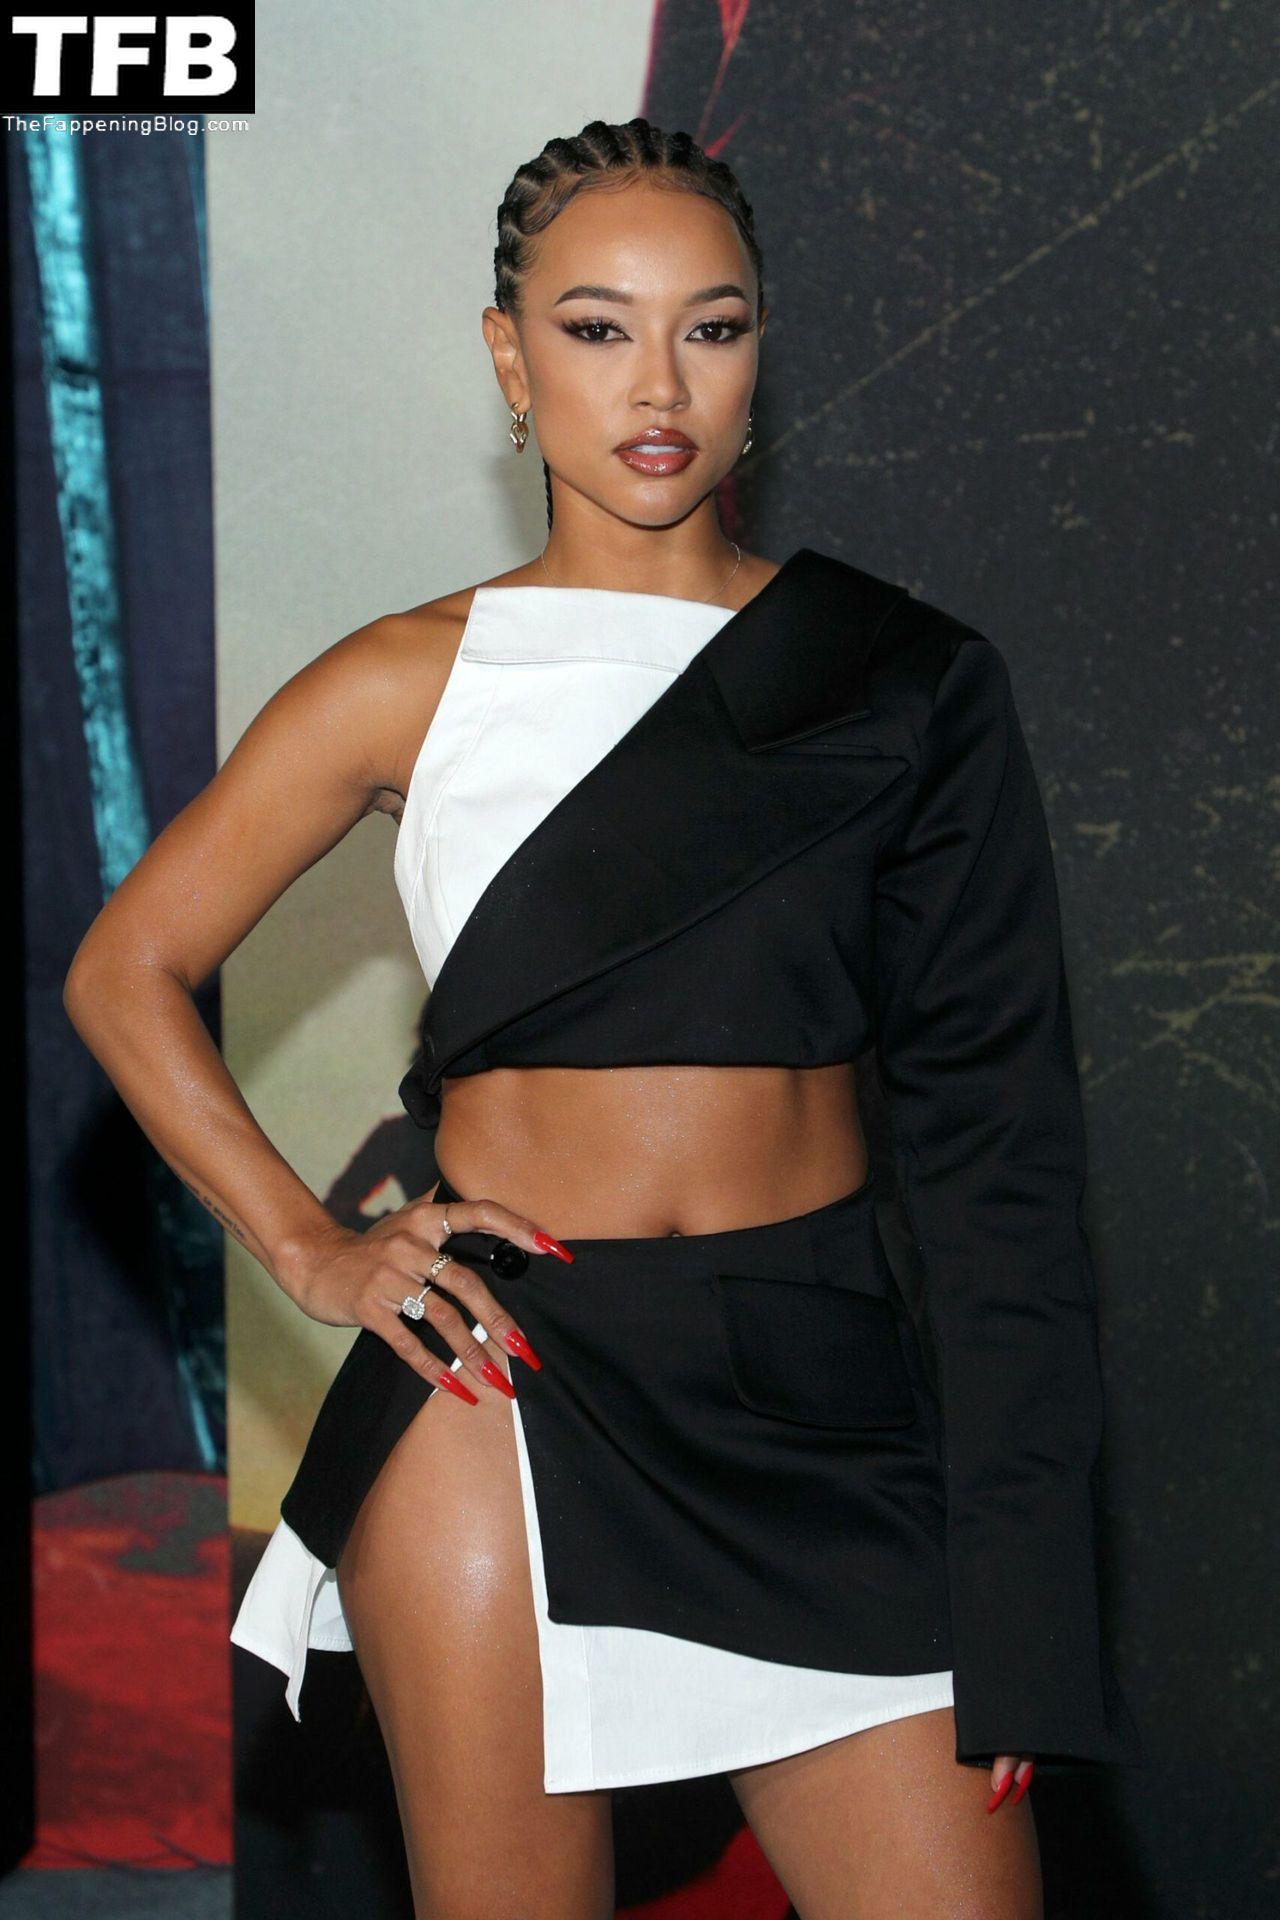 Karrueche-Tran-Sexy-Legs-Upskirt-The-Fappening-Blog-19.jpg